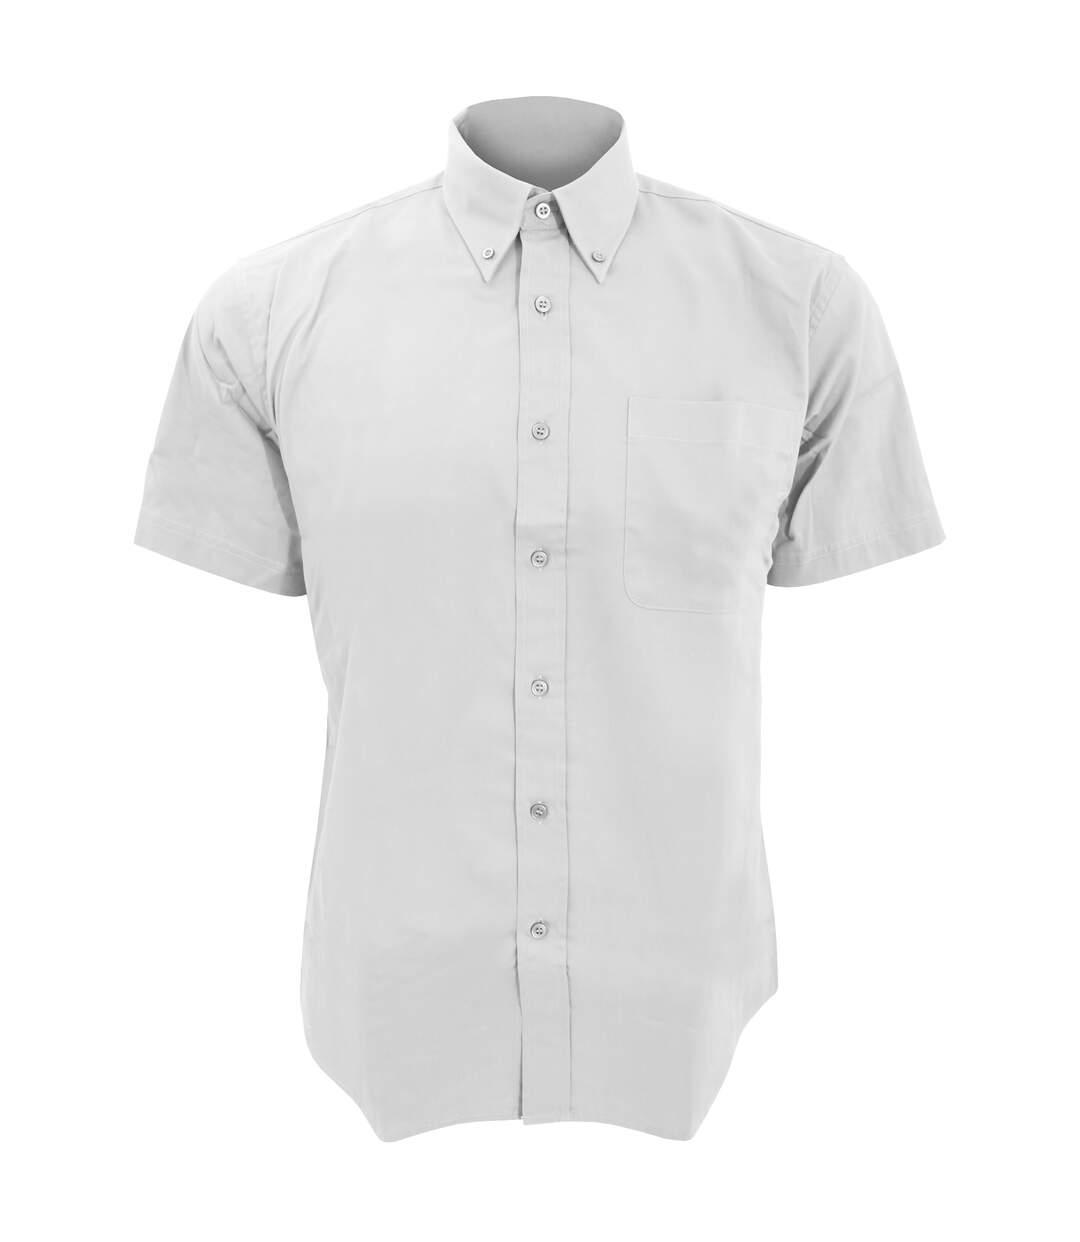 SOLS Mens Brooklyn Short Sleeve Twill Work Shirt (White) - UTPC395